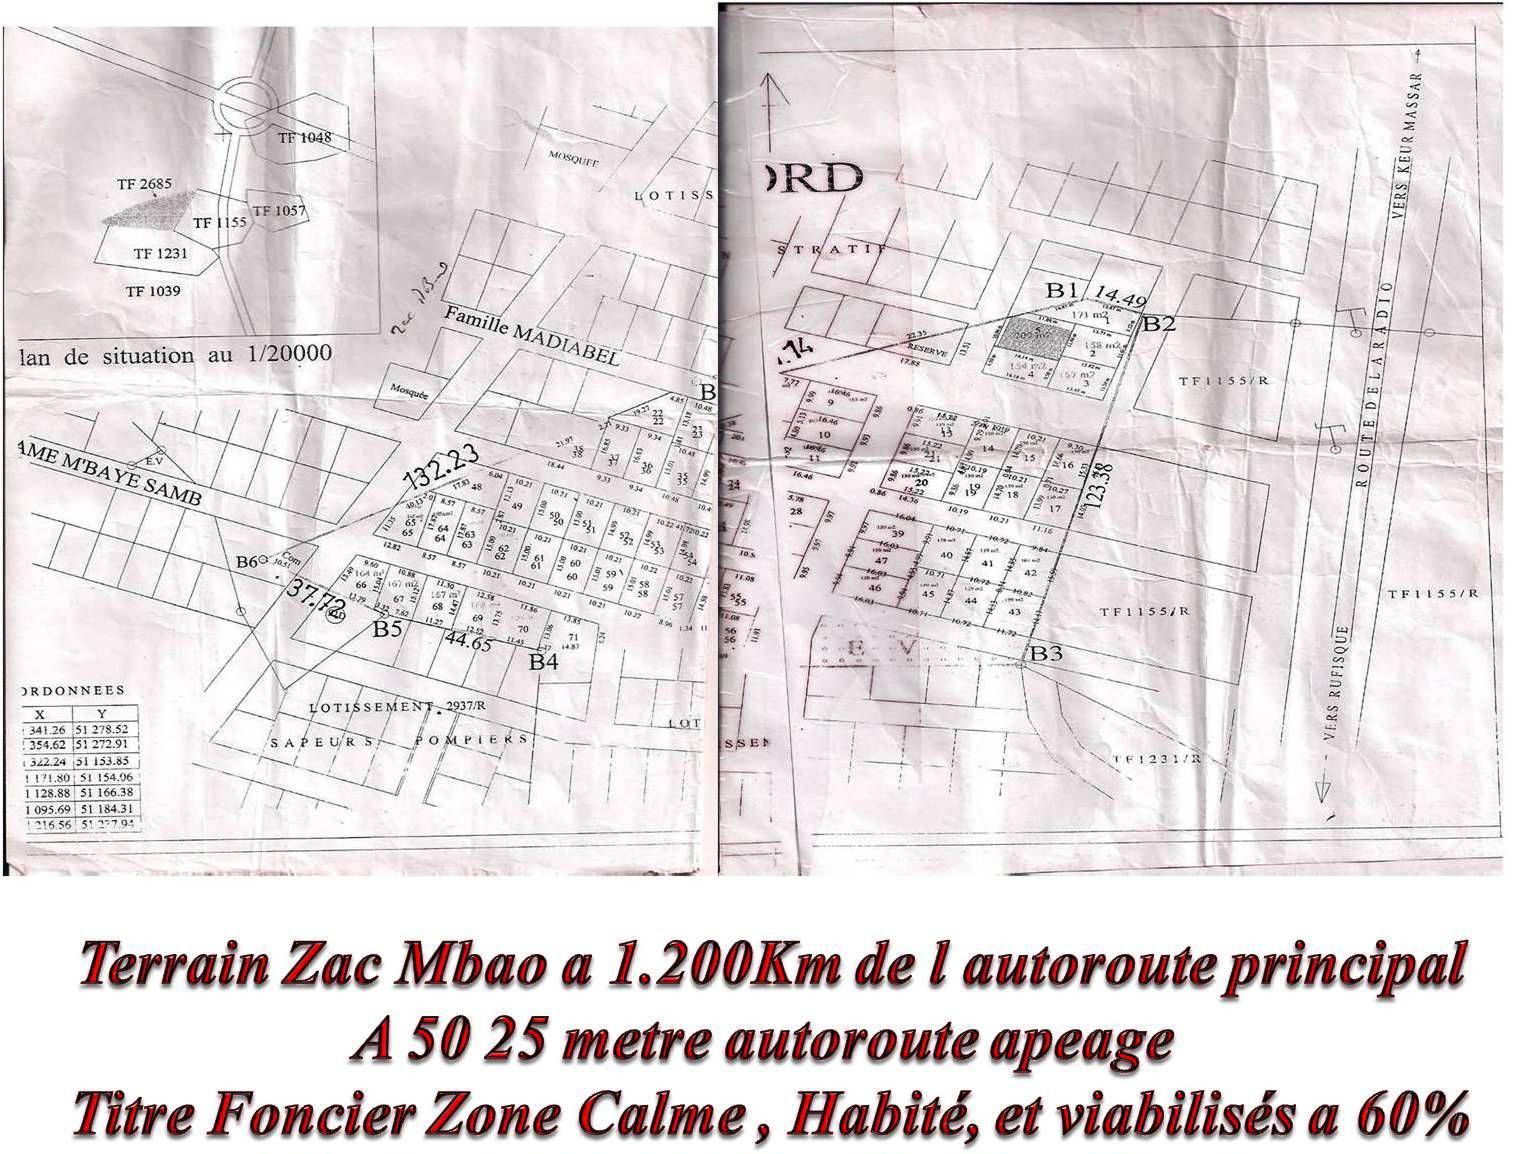 Terrains Zac Mbao